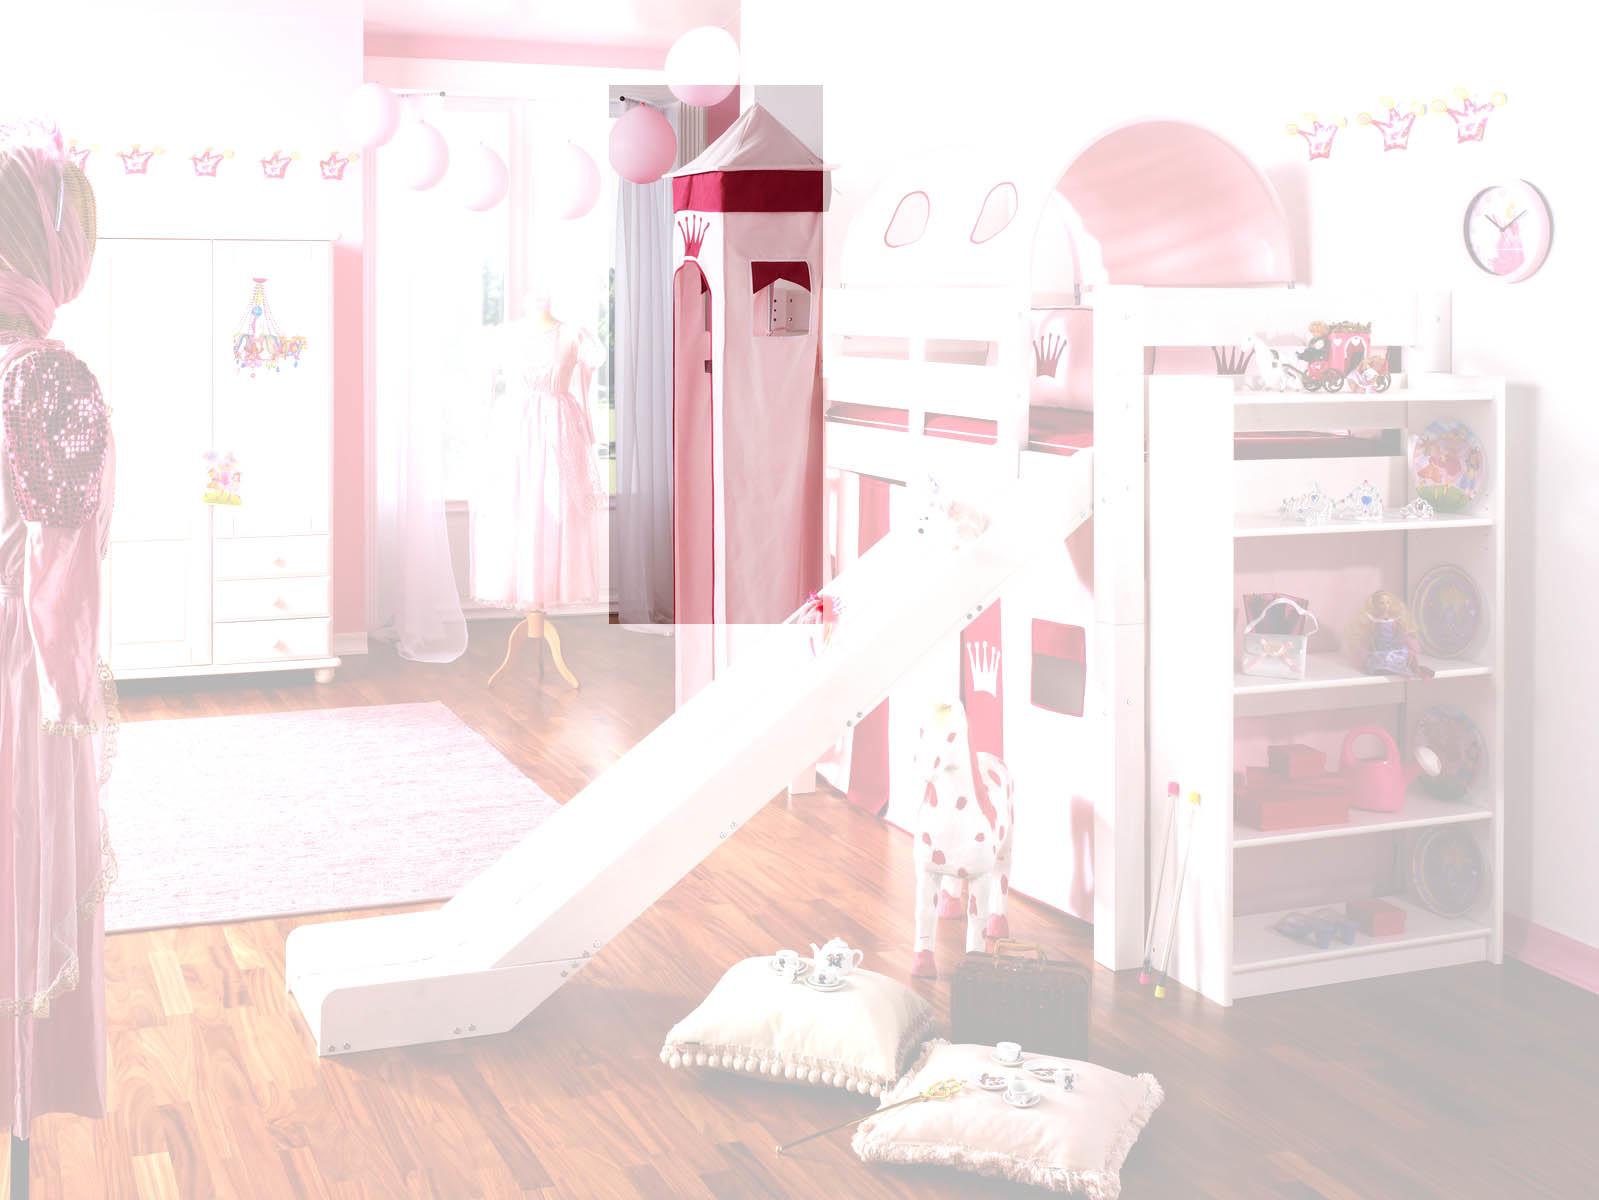 Prinzessinnenbett Hochbett mit Turm, weiß-rosa, Massivholz, Bild 4